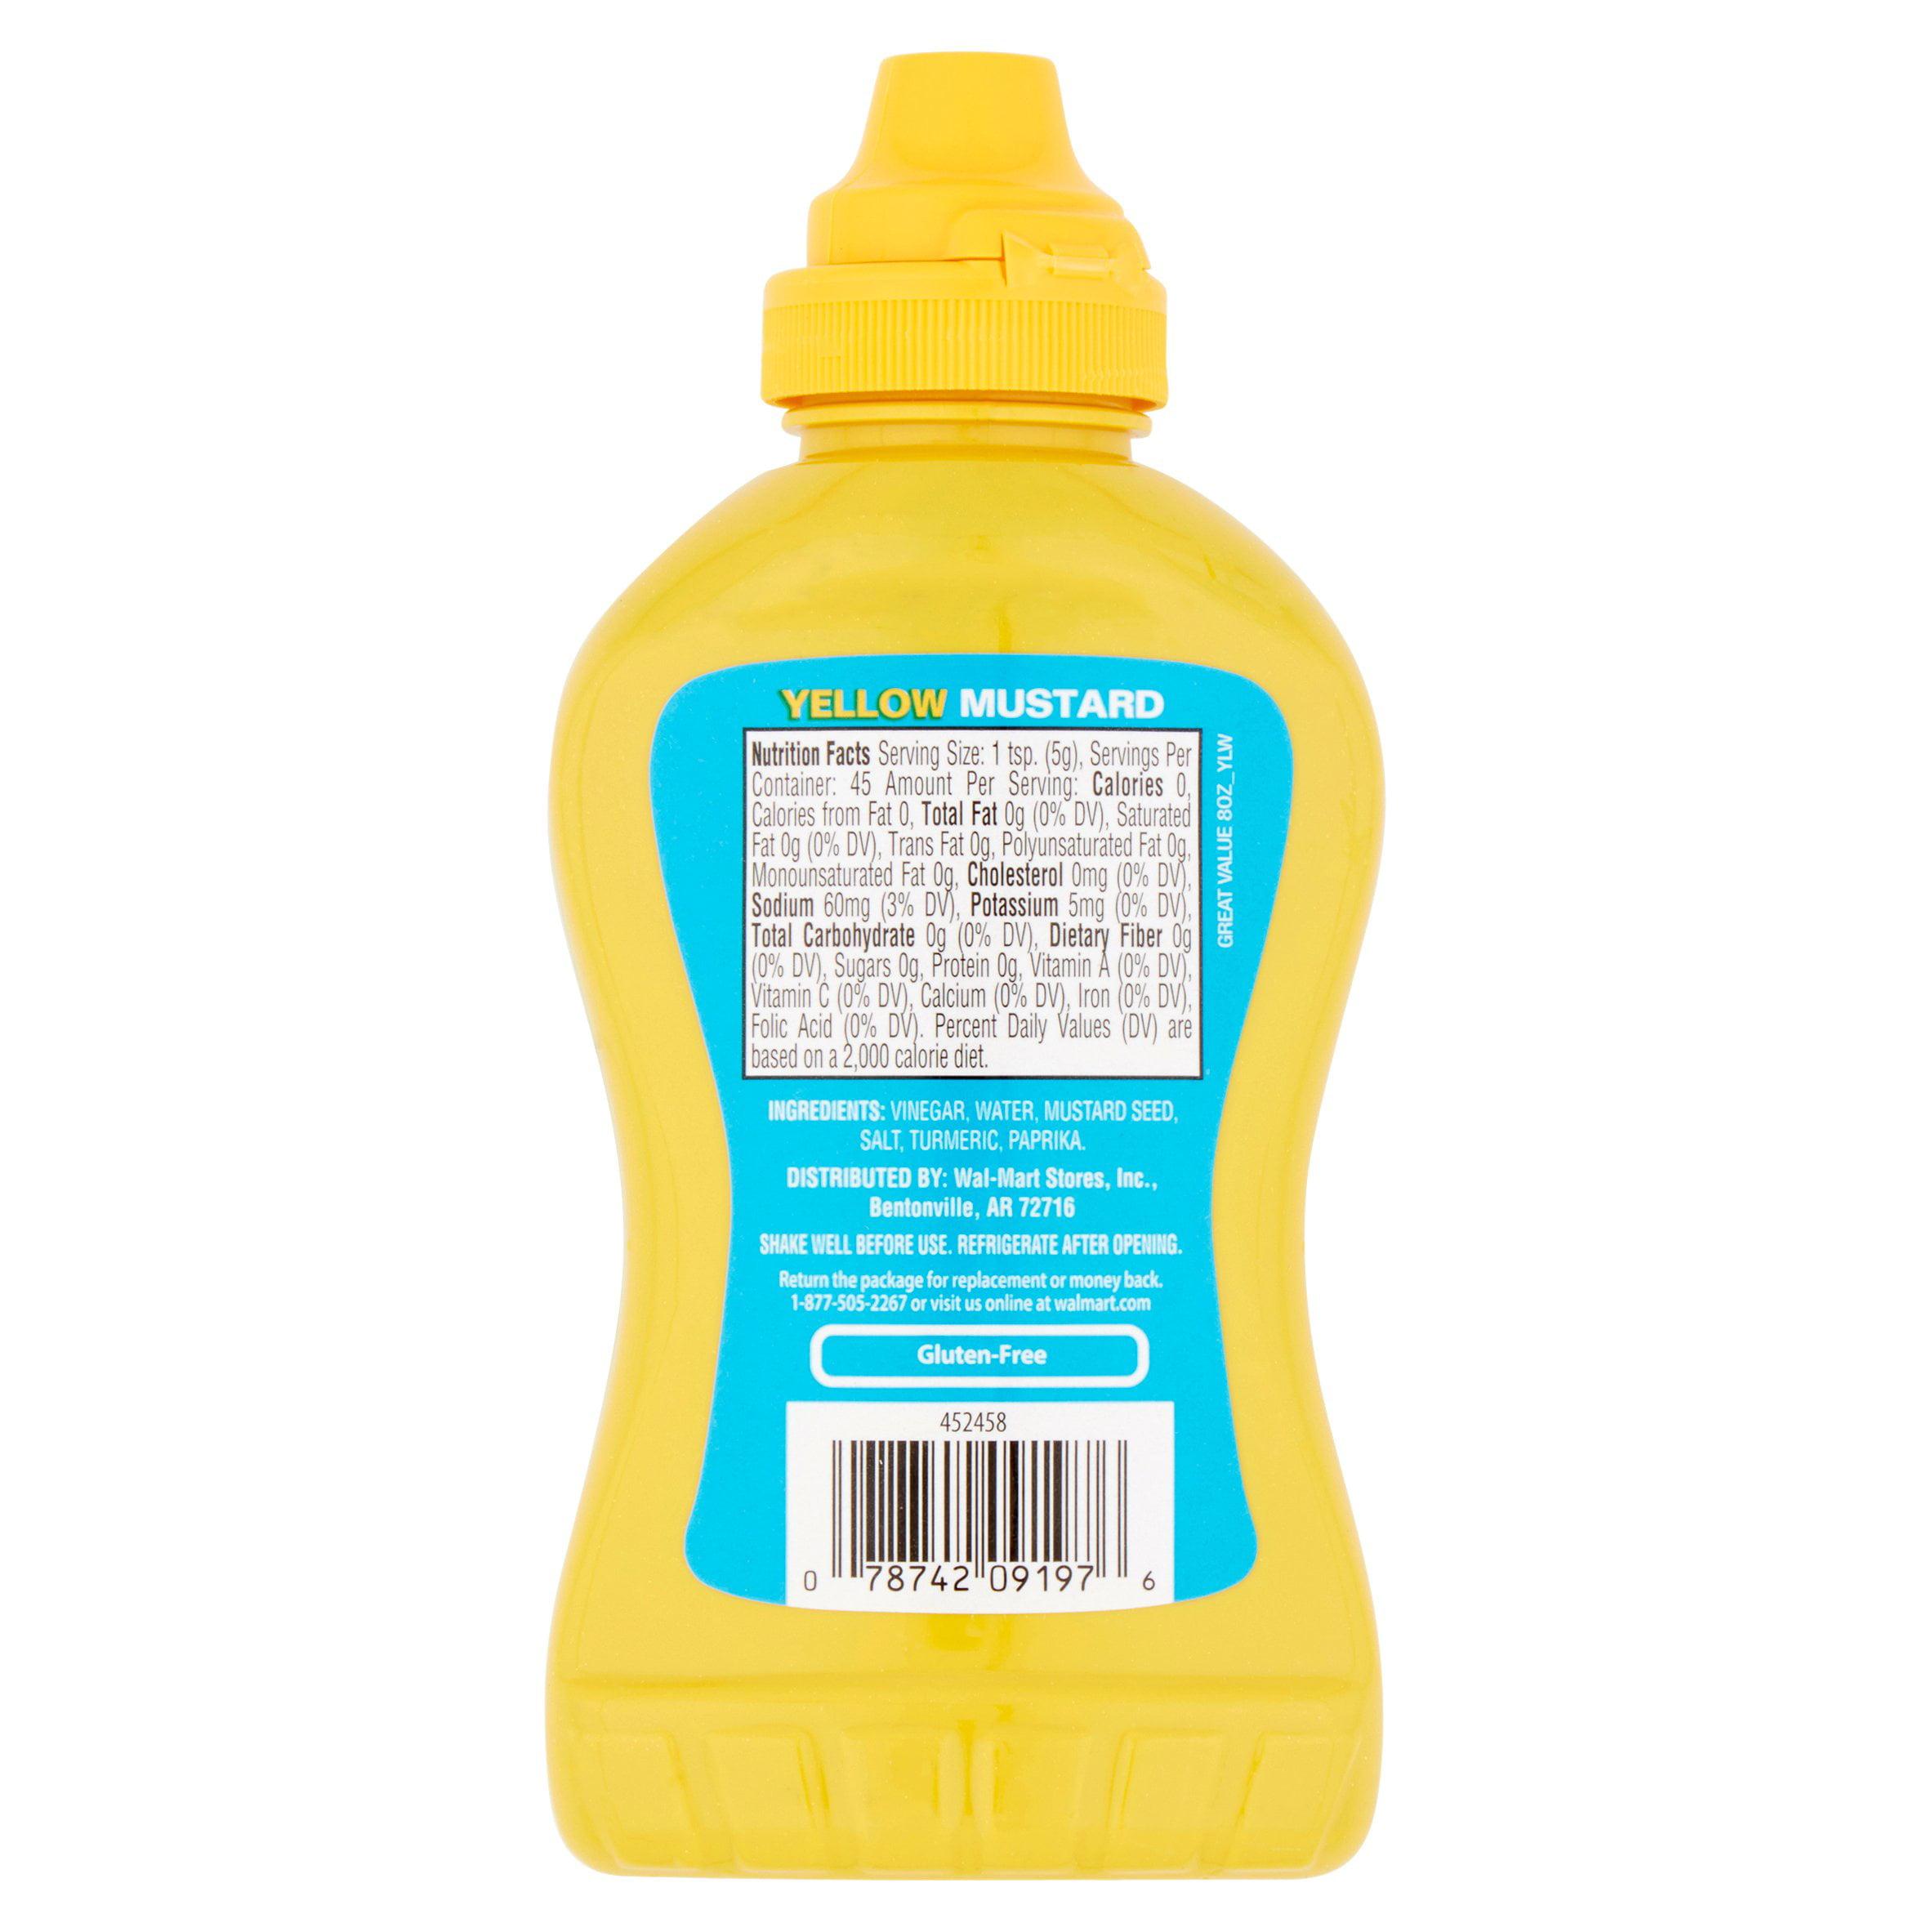 Great Value Yellow Mustard, 8 oz (4 Pack) - Walmart.com